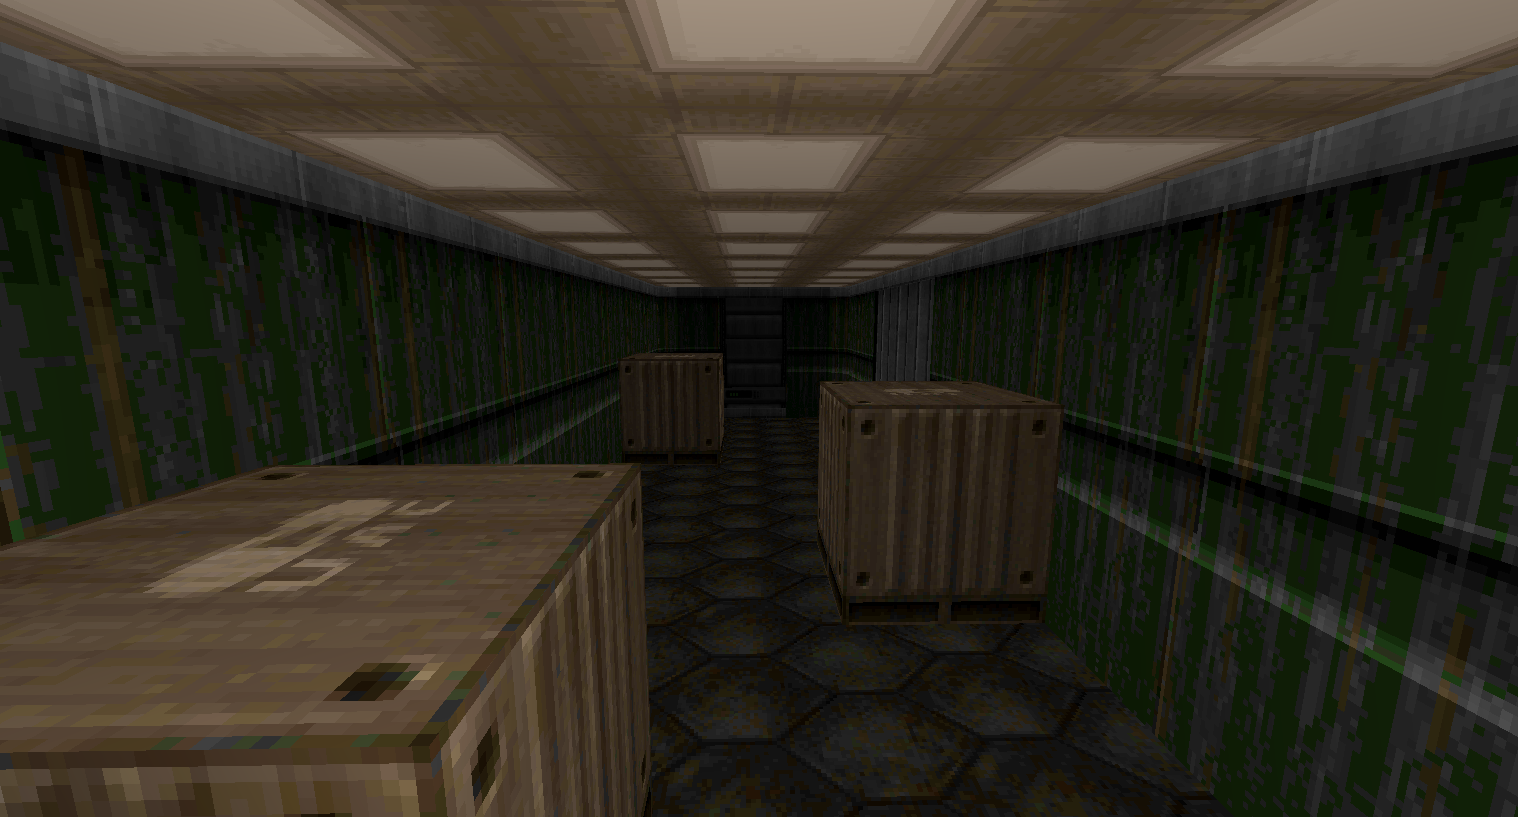 Screenshot_Doom_20210317_022541.png.3f2bd3125c187abe30e4391b3830d638.png